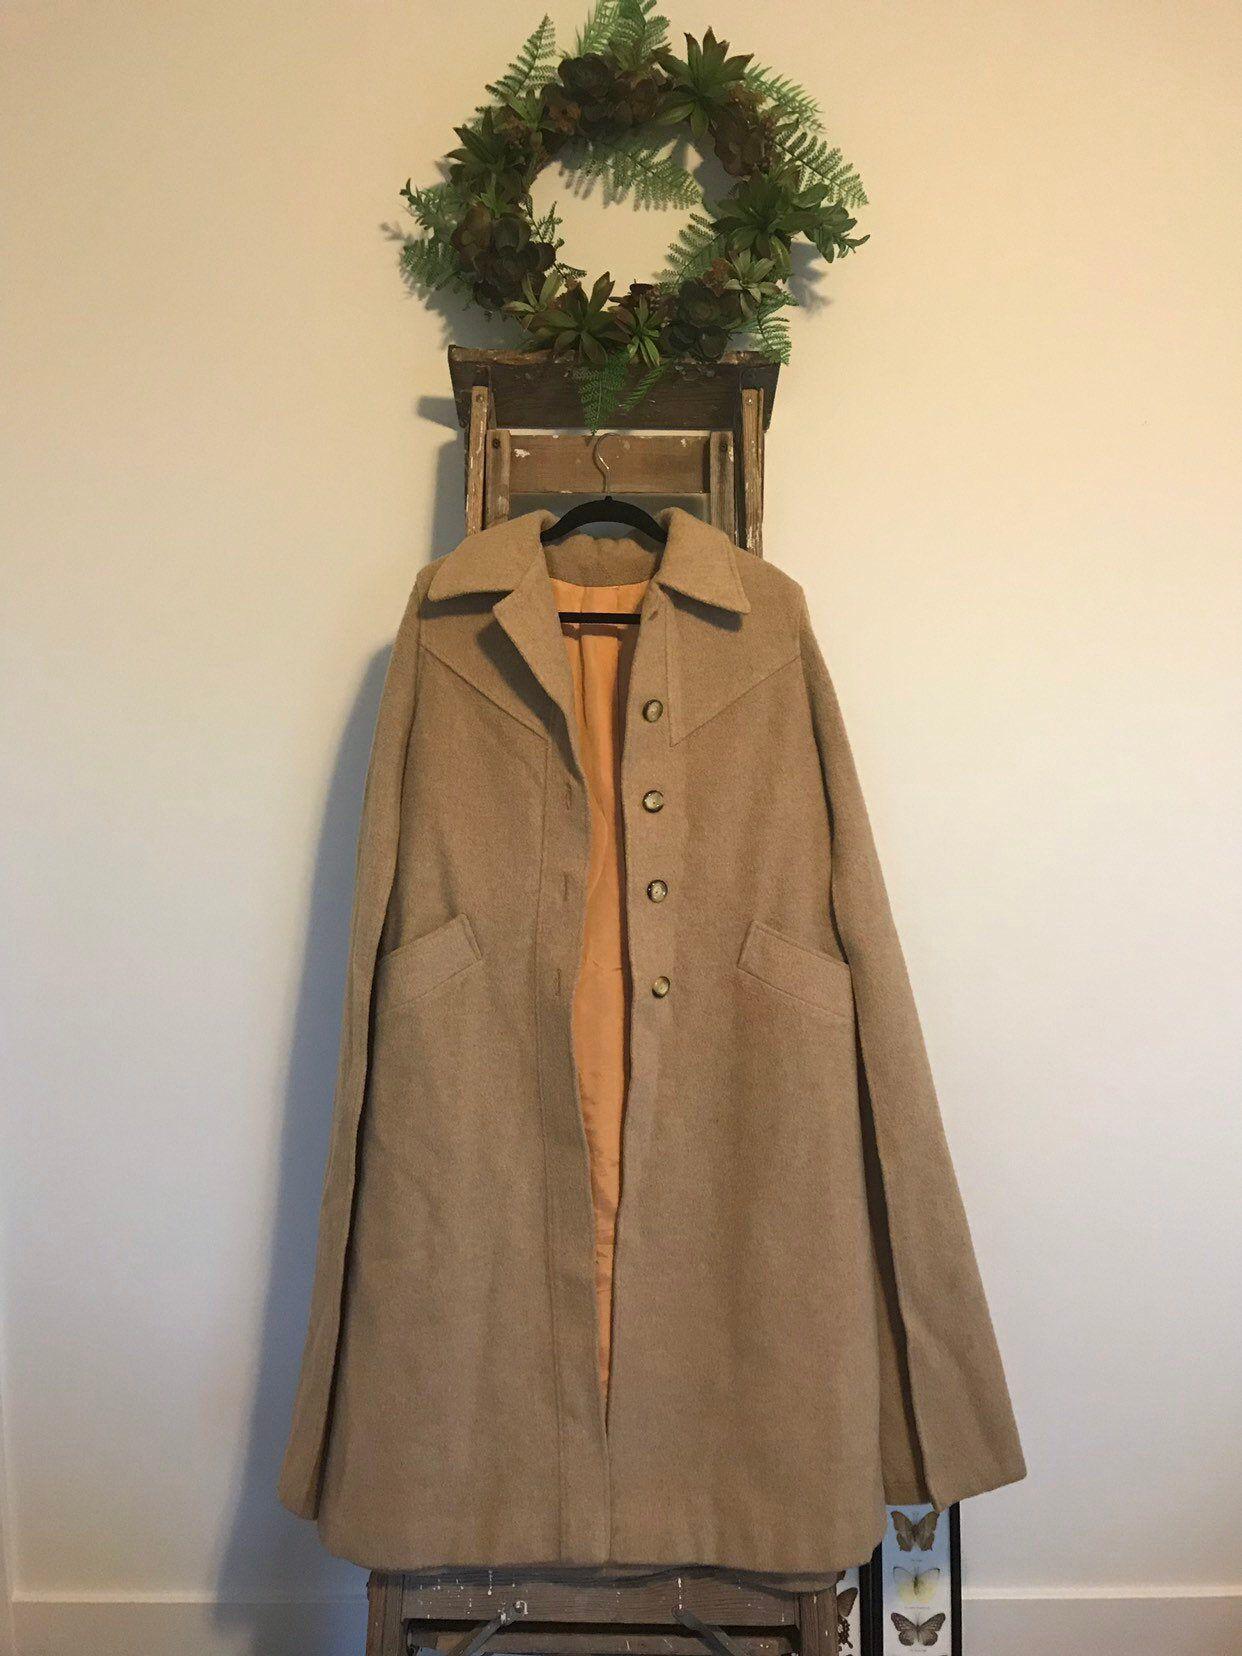 Vintage Wool George David Fashions Cape Cloak  Etsy  Cape